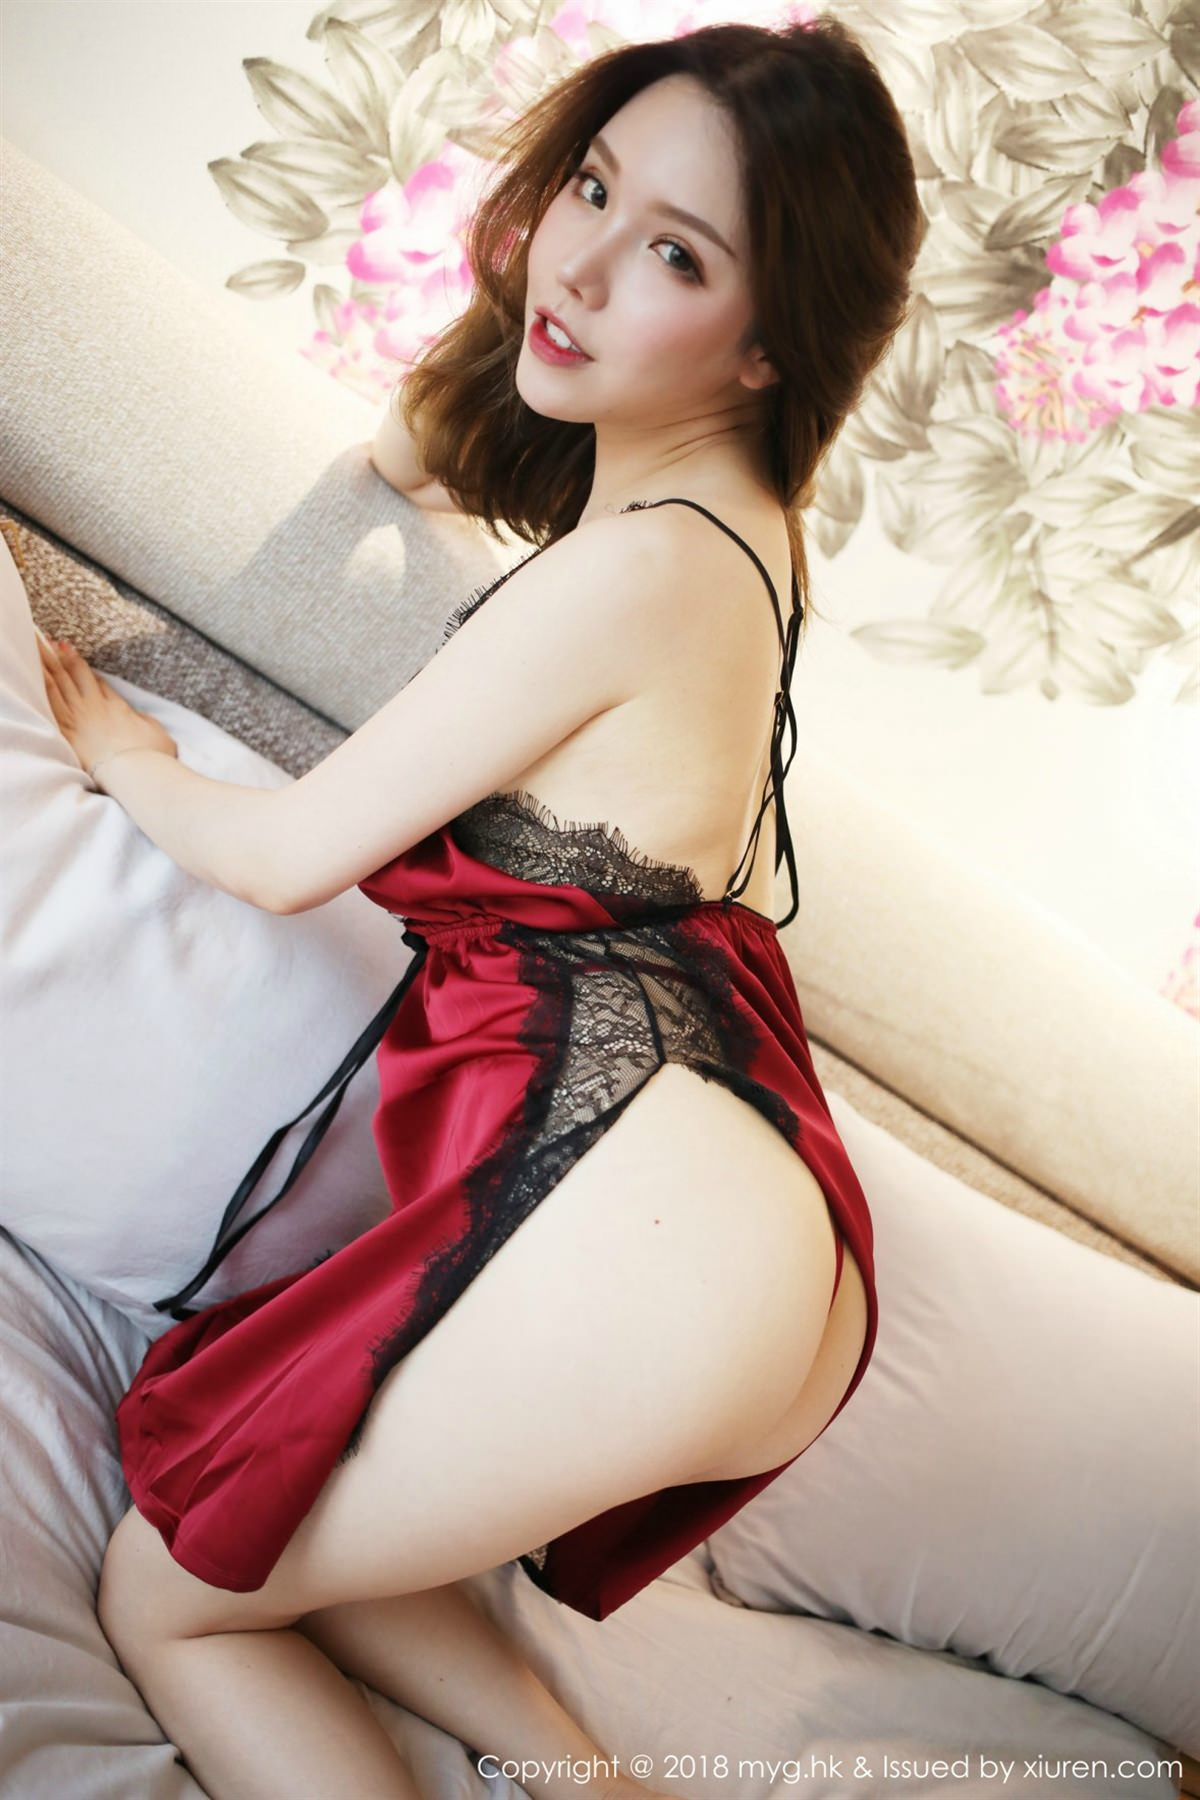 MyGirl Vol.292 32P, Huang Le Ran, mygirl